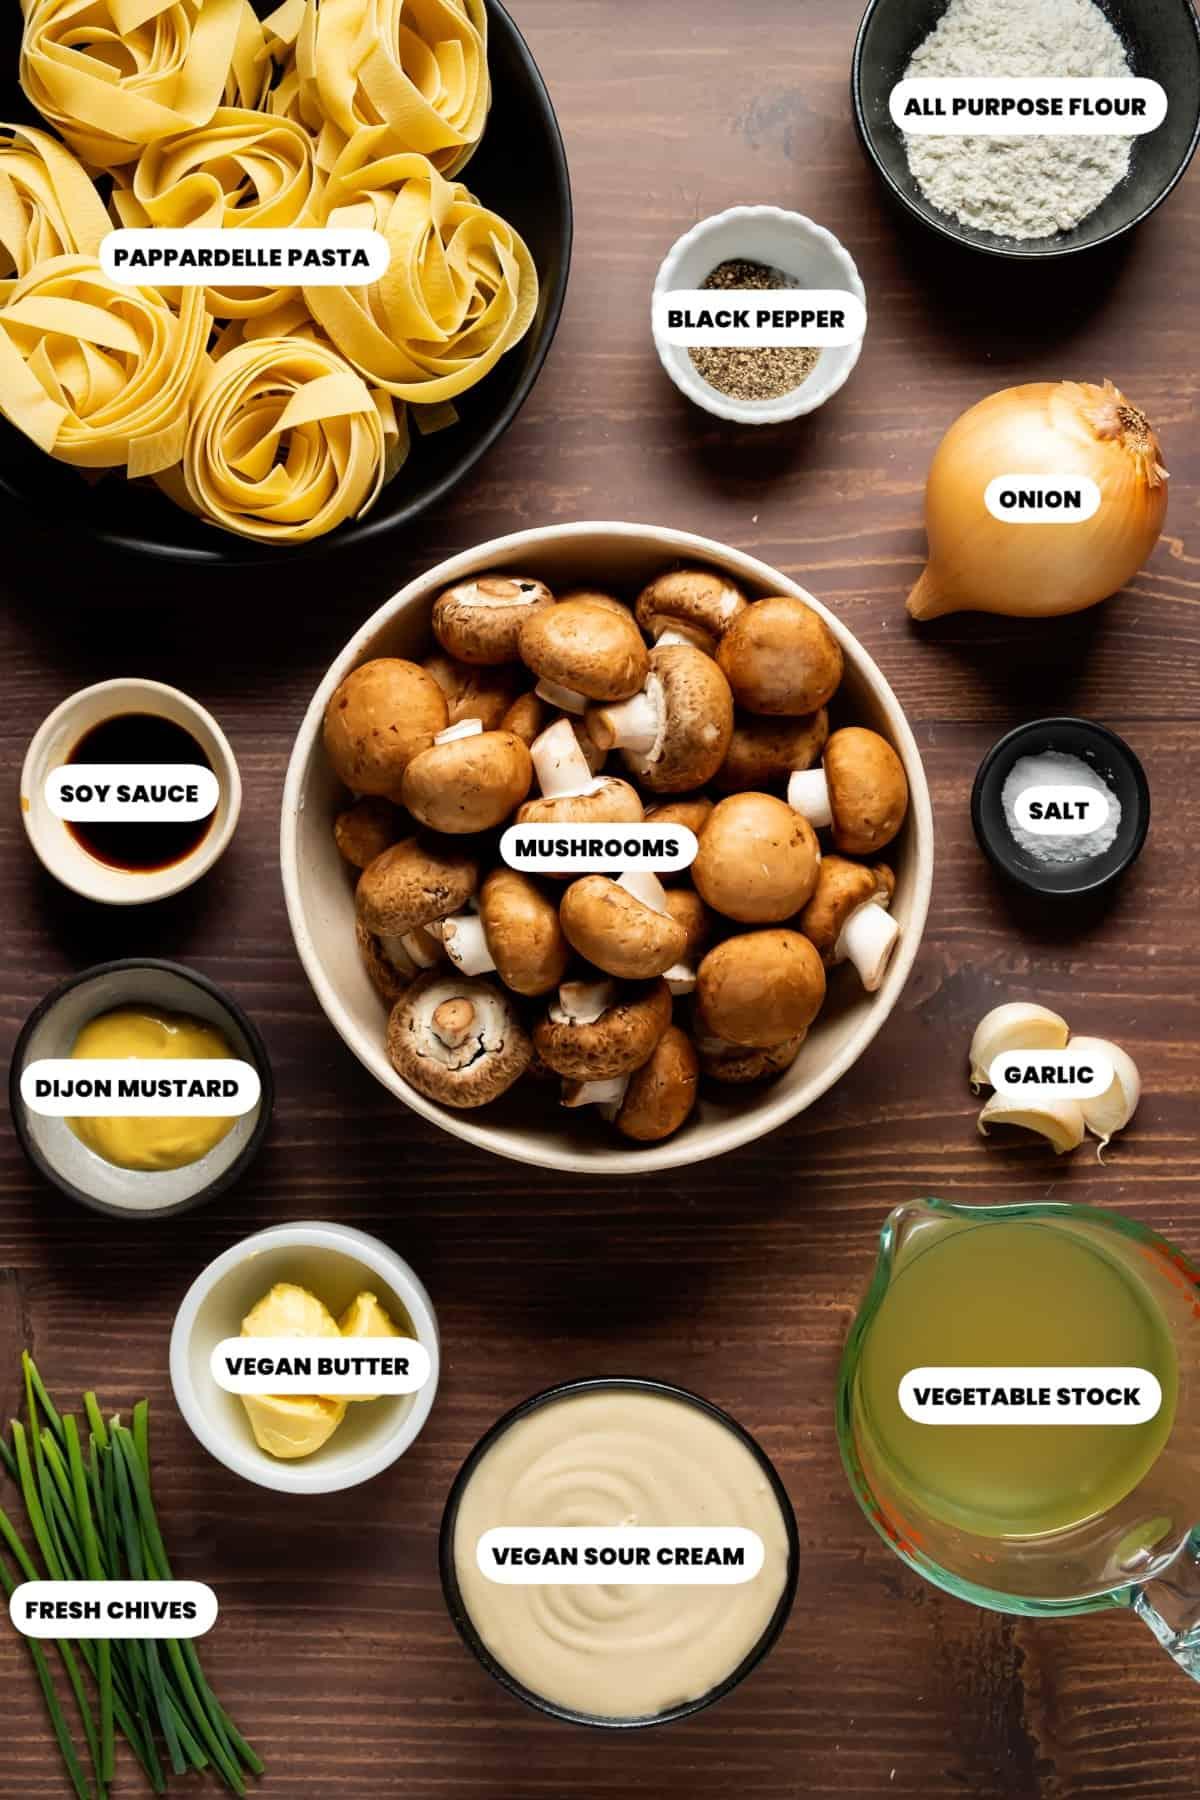 Photo of the ingredients needed to make vegan mushroom stroganoff.